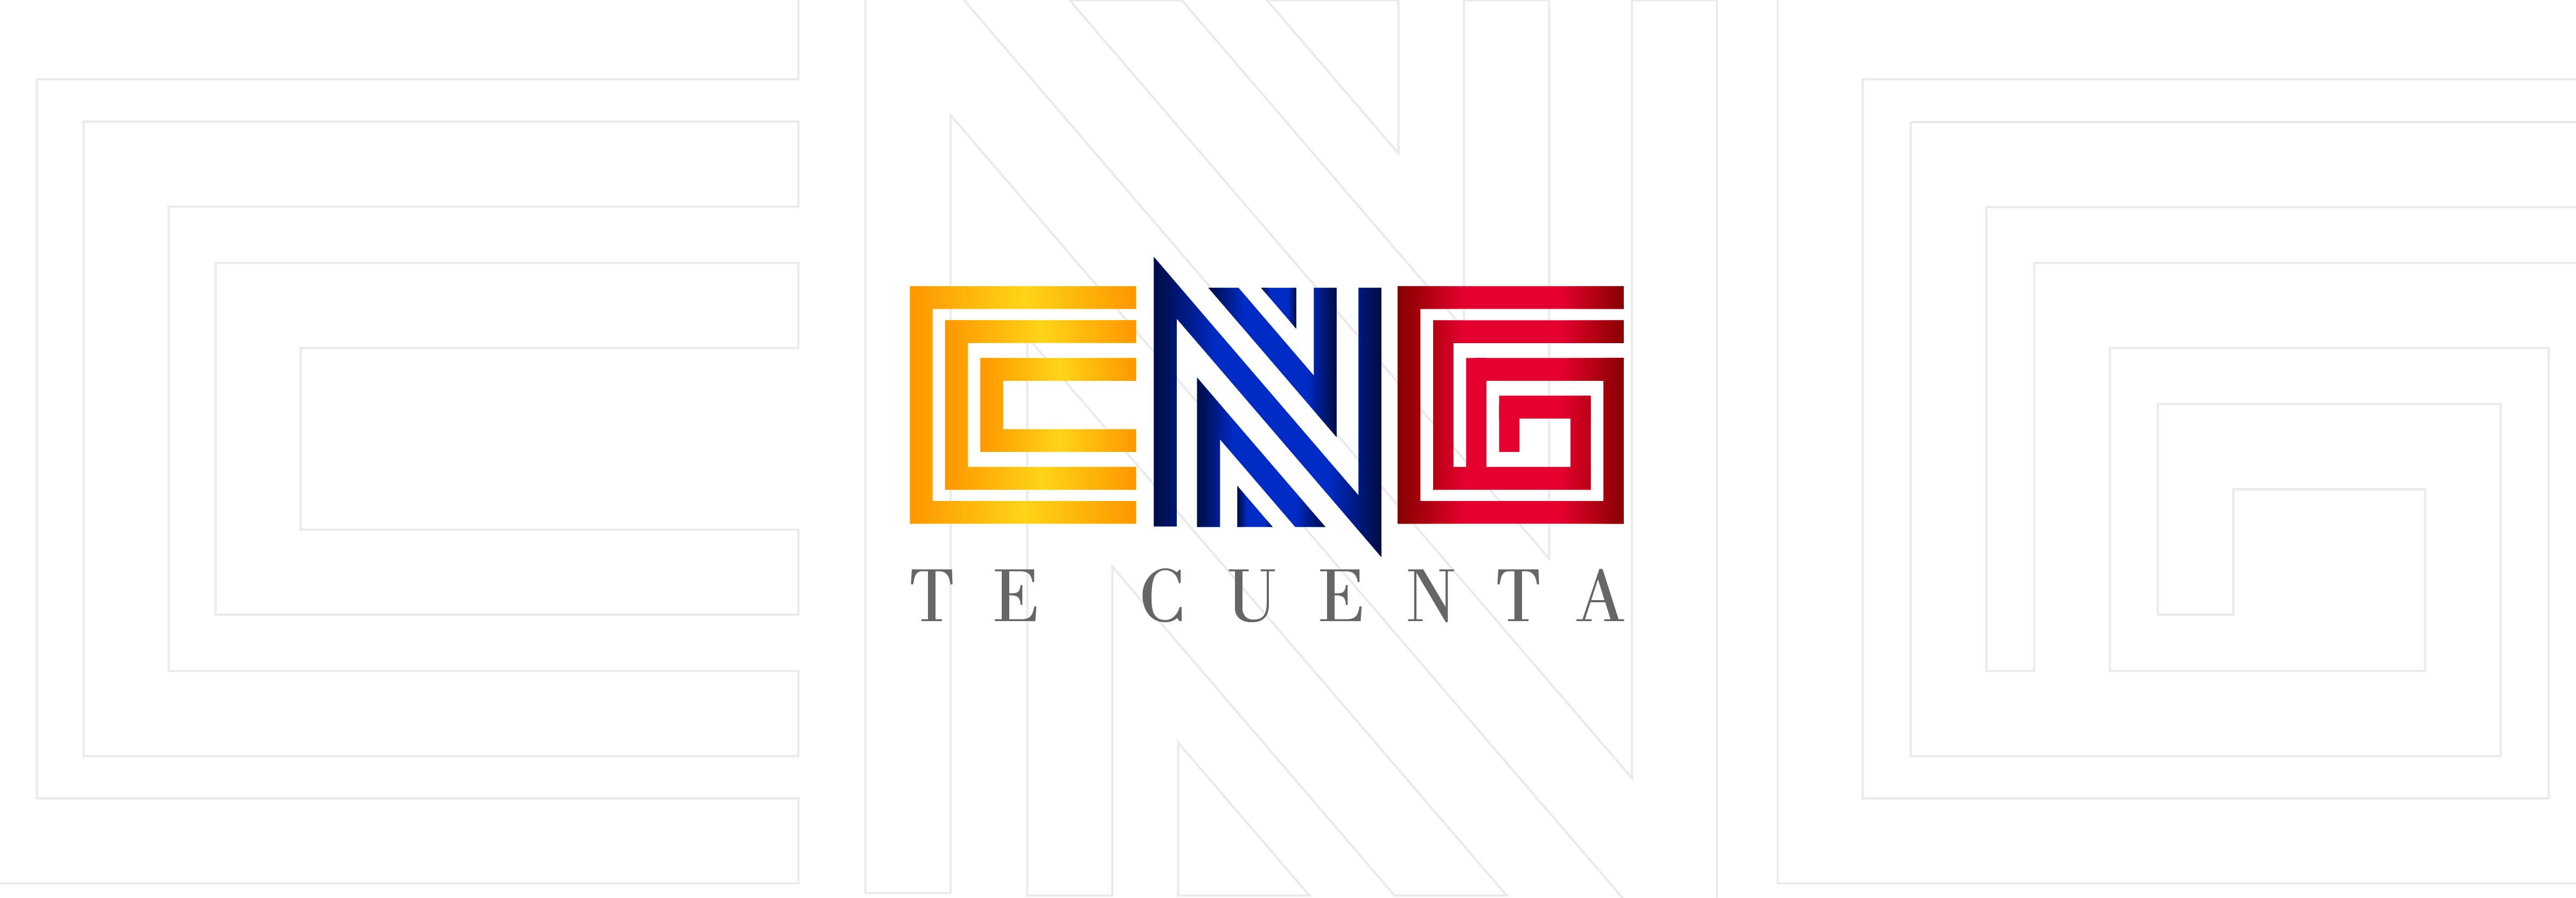 Logo CNG te cuenta